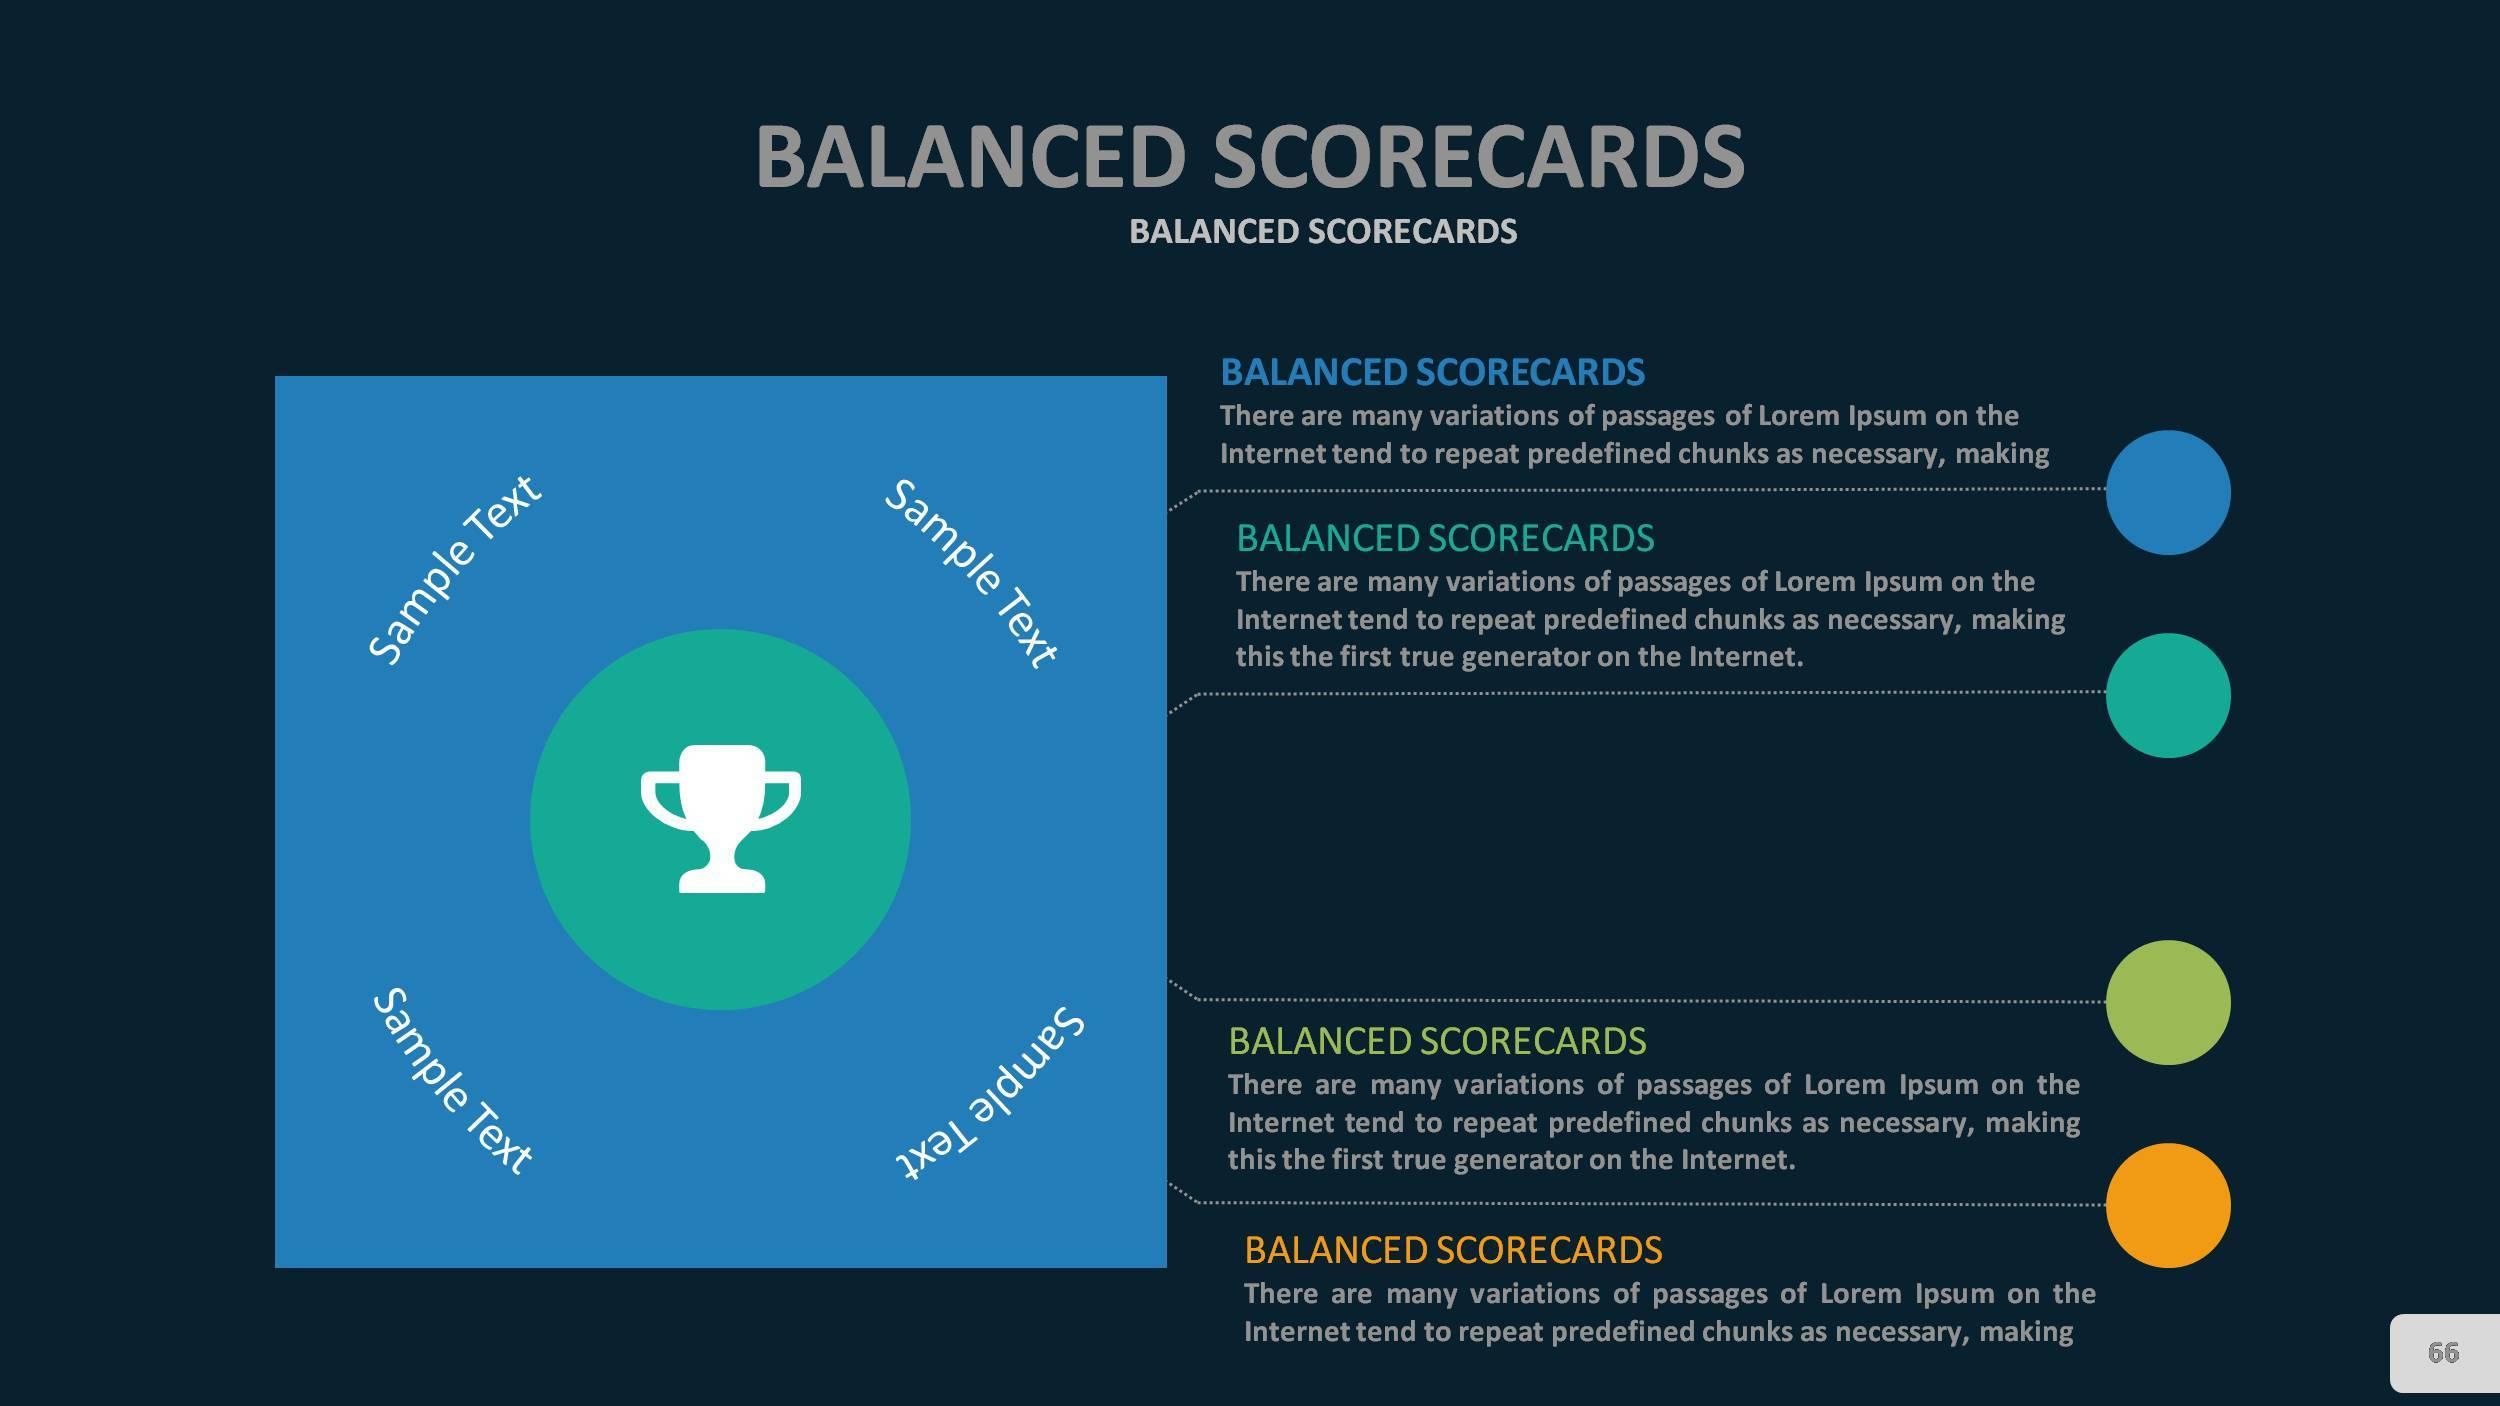 balanced scorecard in hydro power generation in india